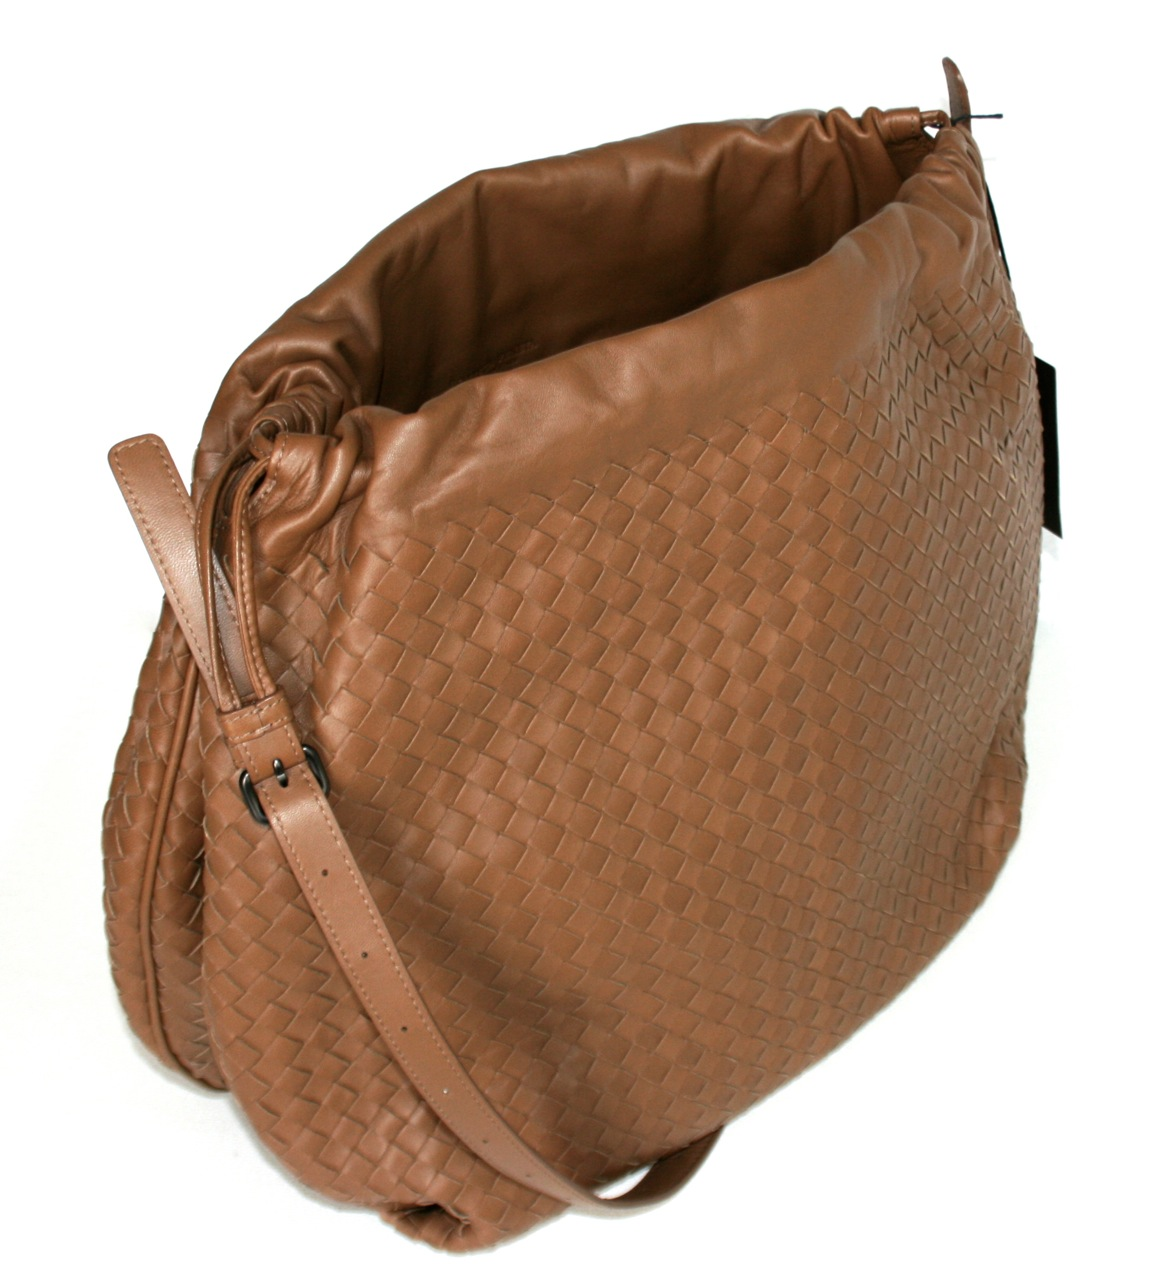 luxus bottega veneta schulter tasche handtasche v0016. Black Bedroom Furniture Sets. Home Design Ideas